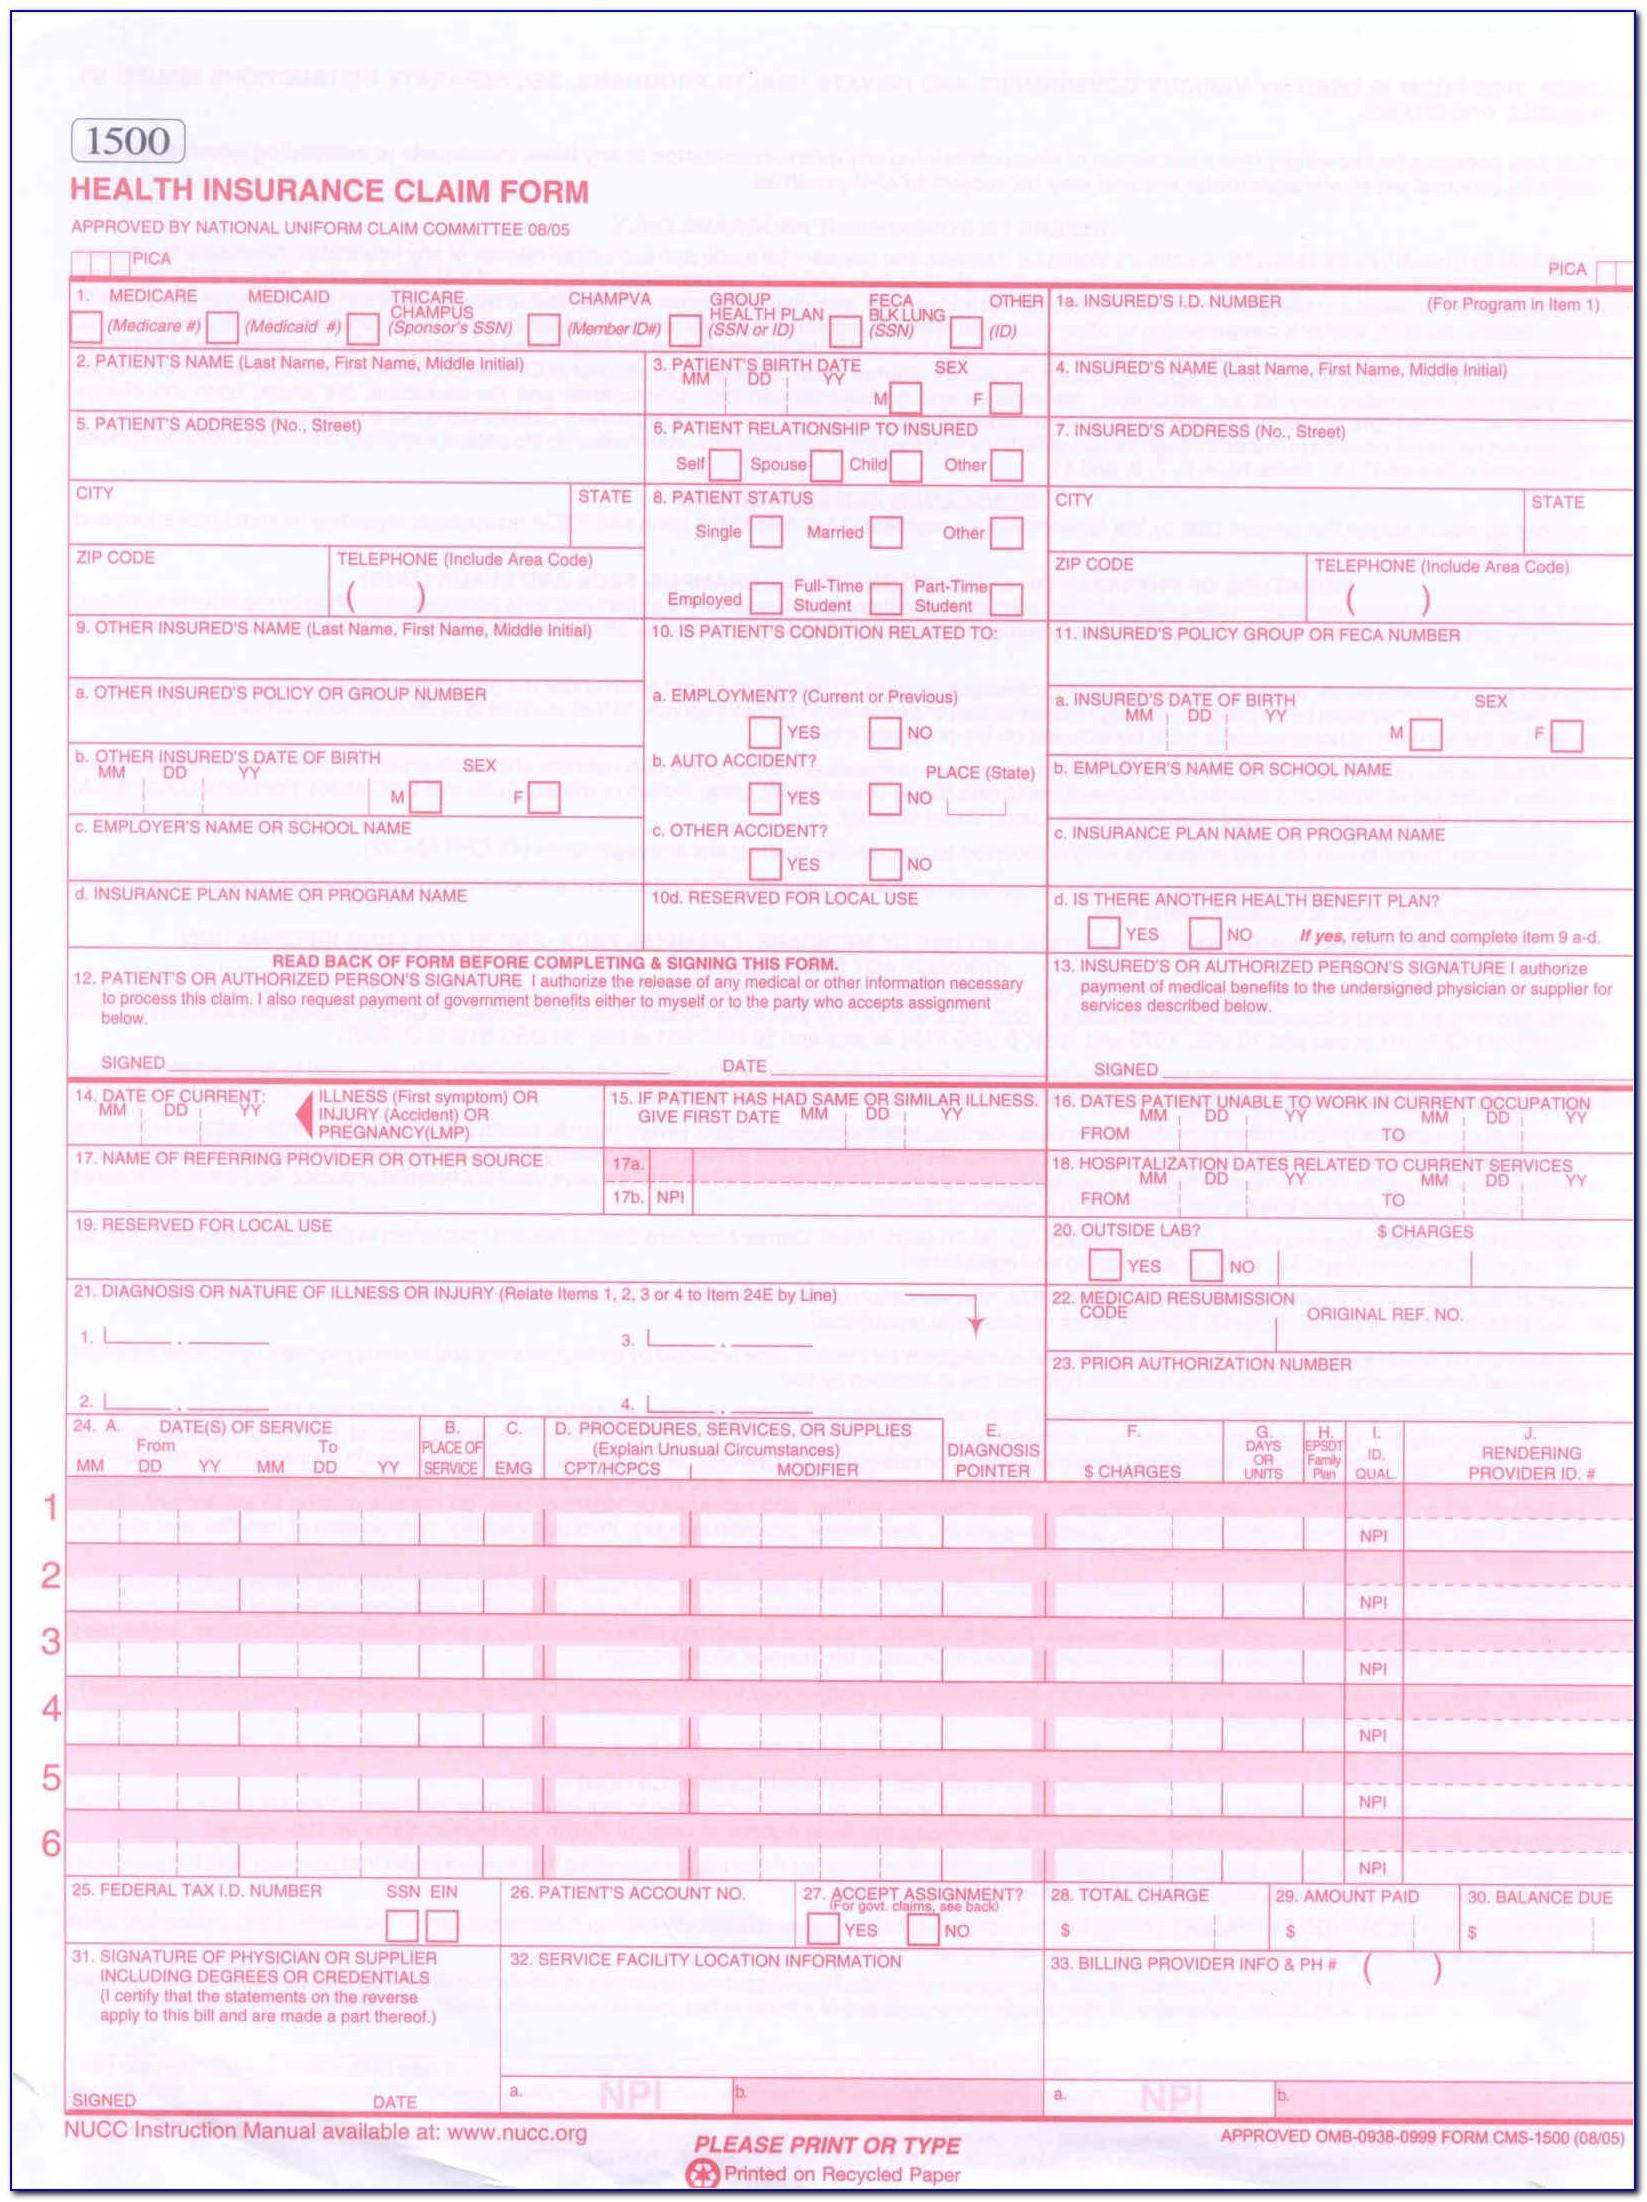 Cms 1500 Form Printable 2018